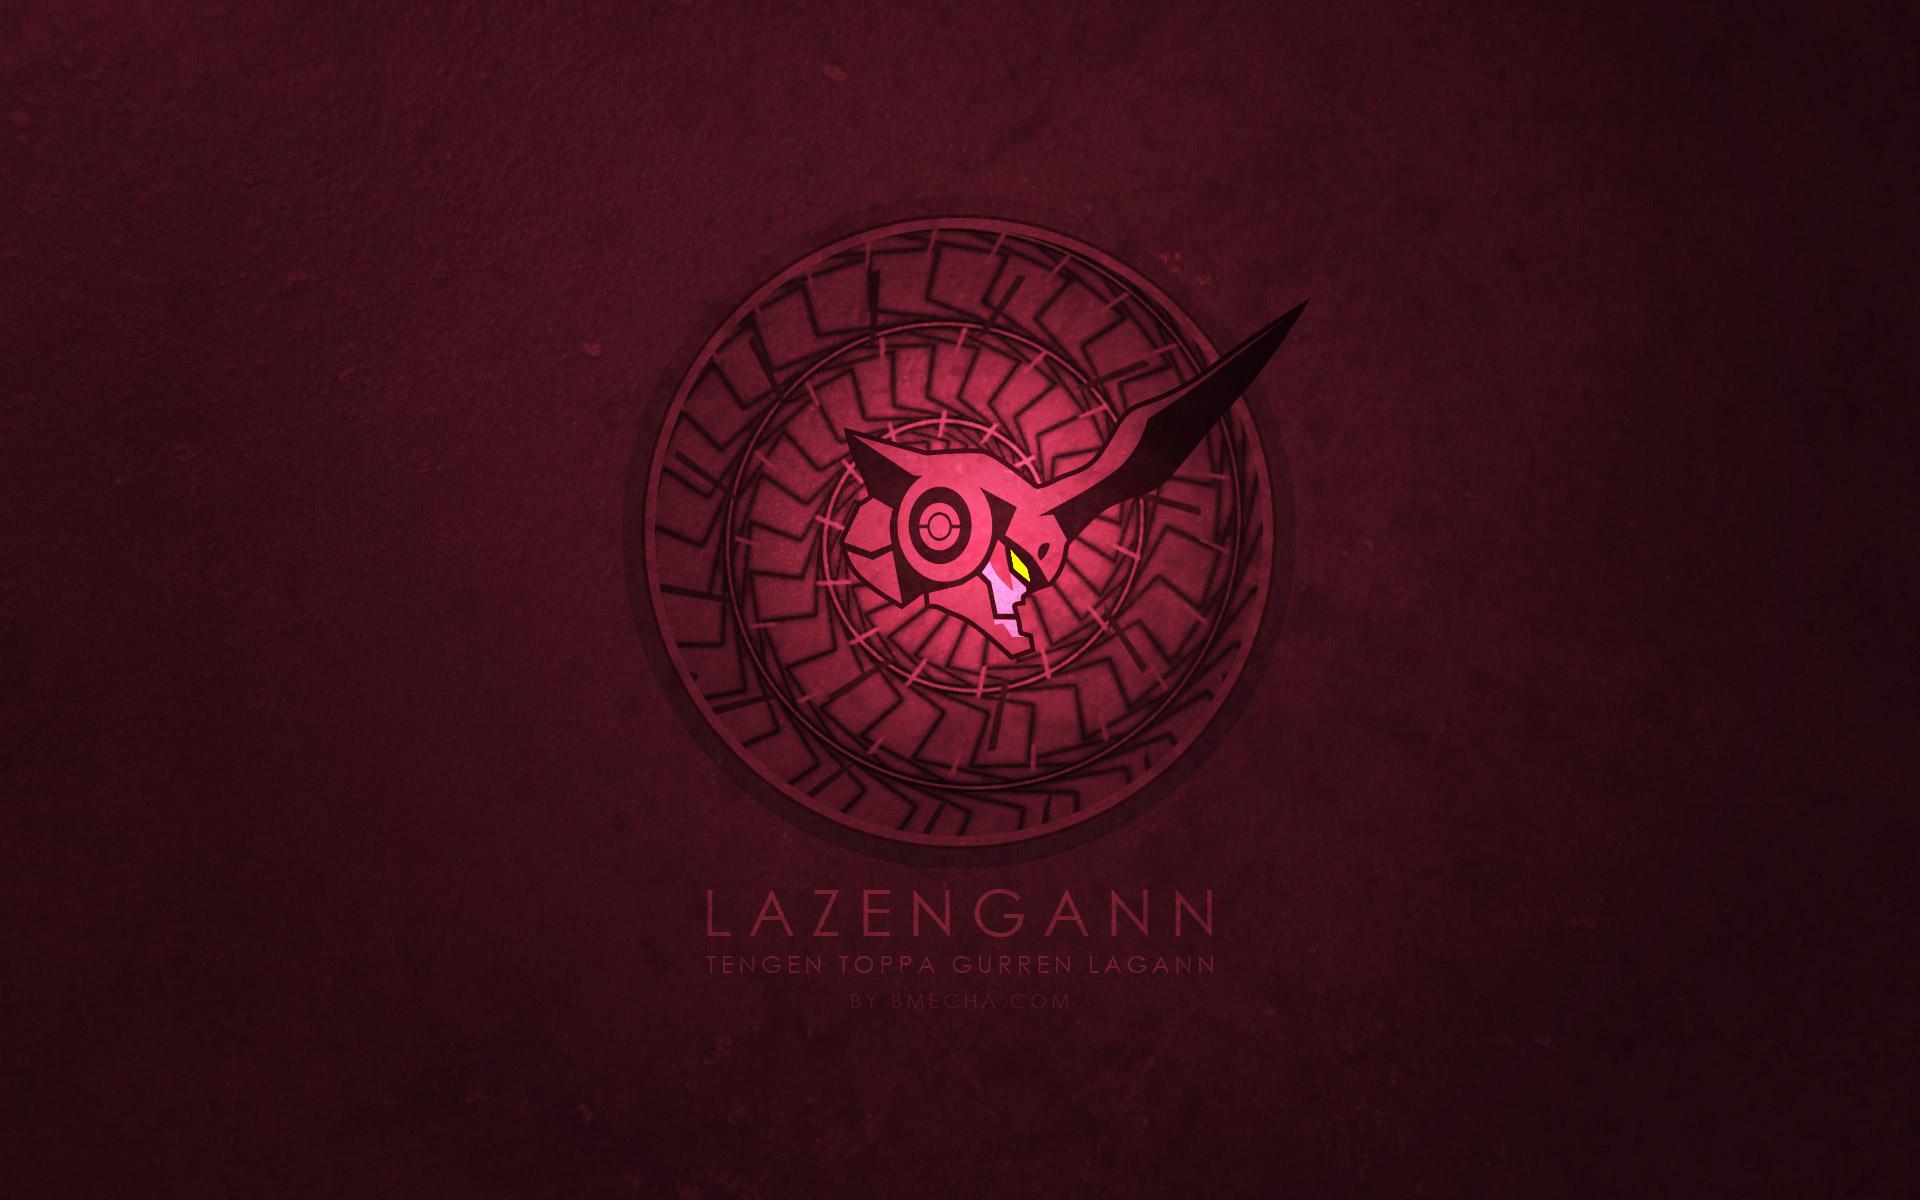 Lazengann 1900x1200 Wallpaper 1920x1200 Lazengann 1900x1200 1920x1200